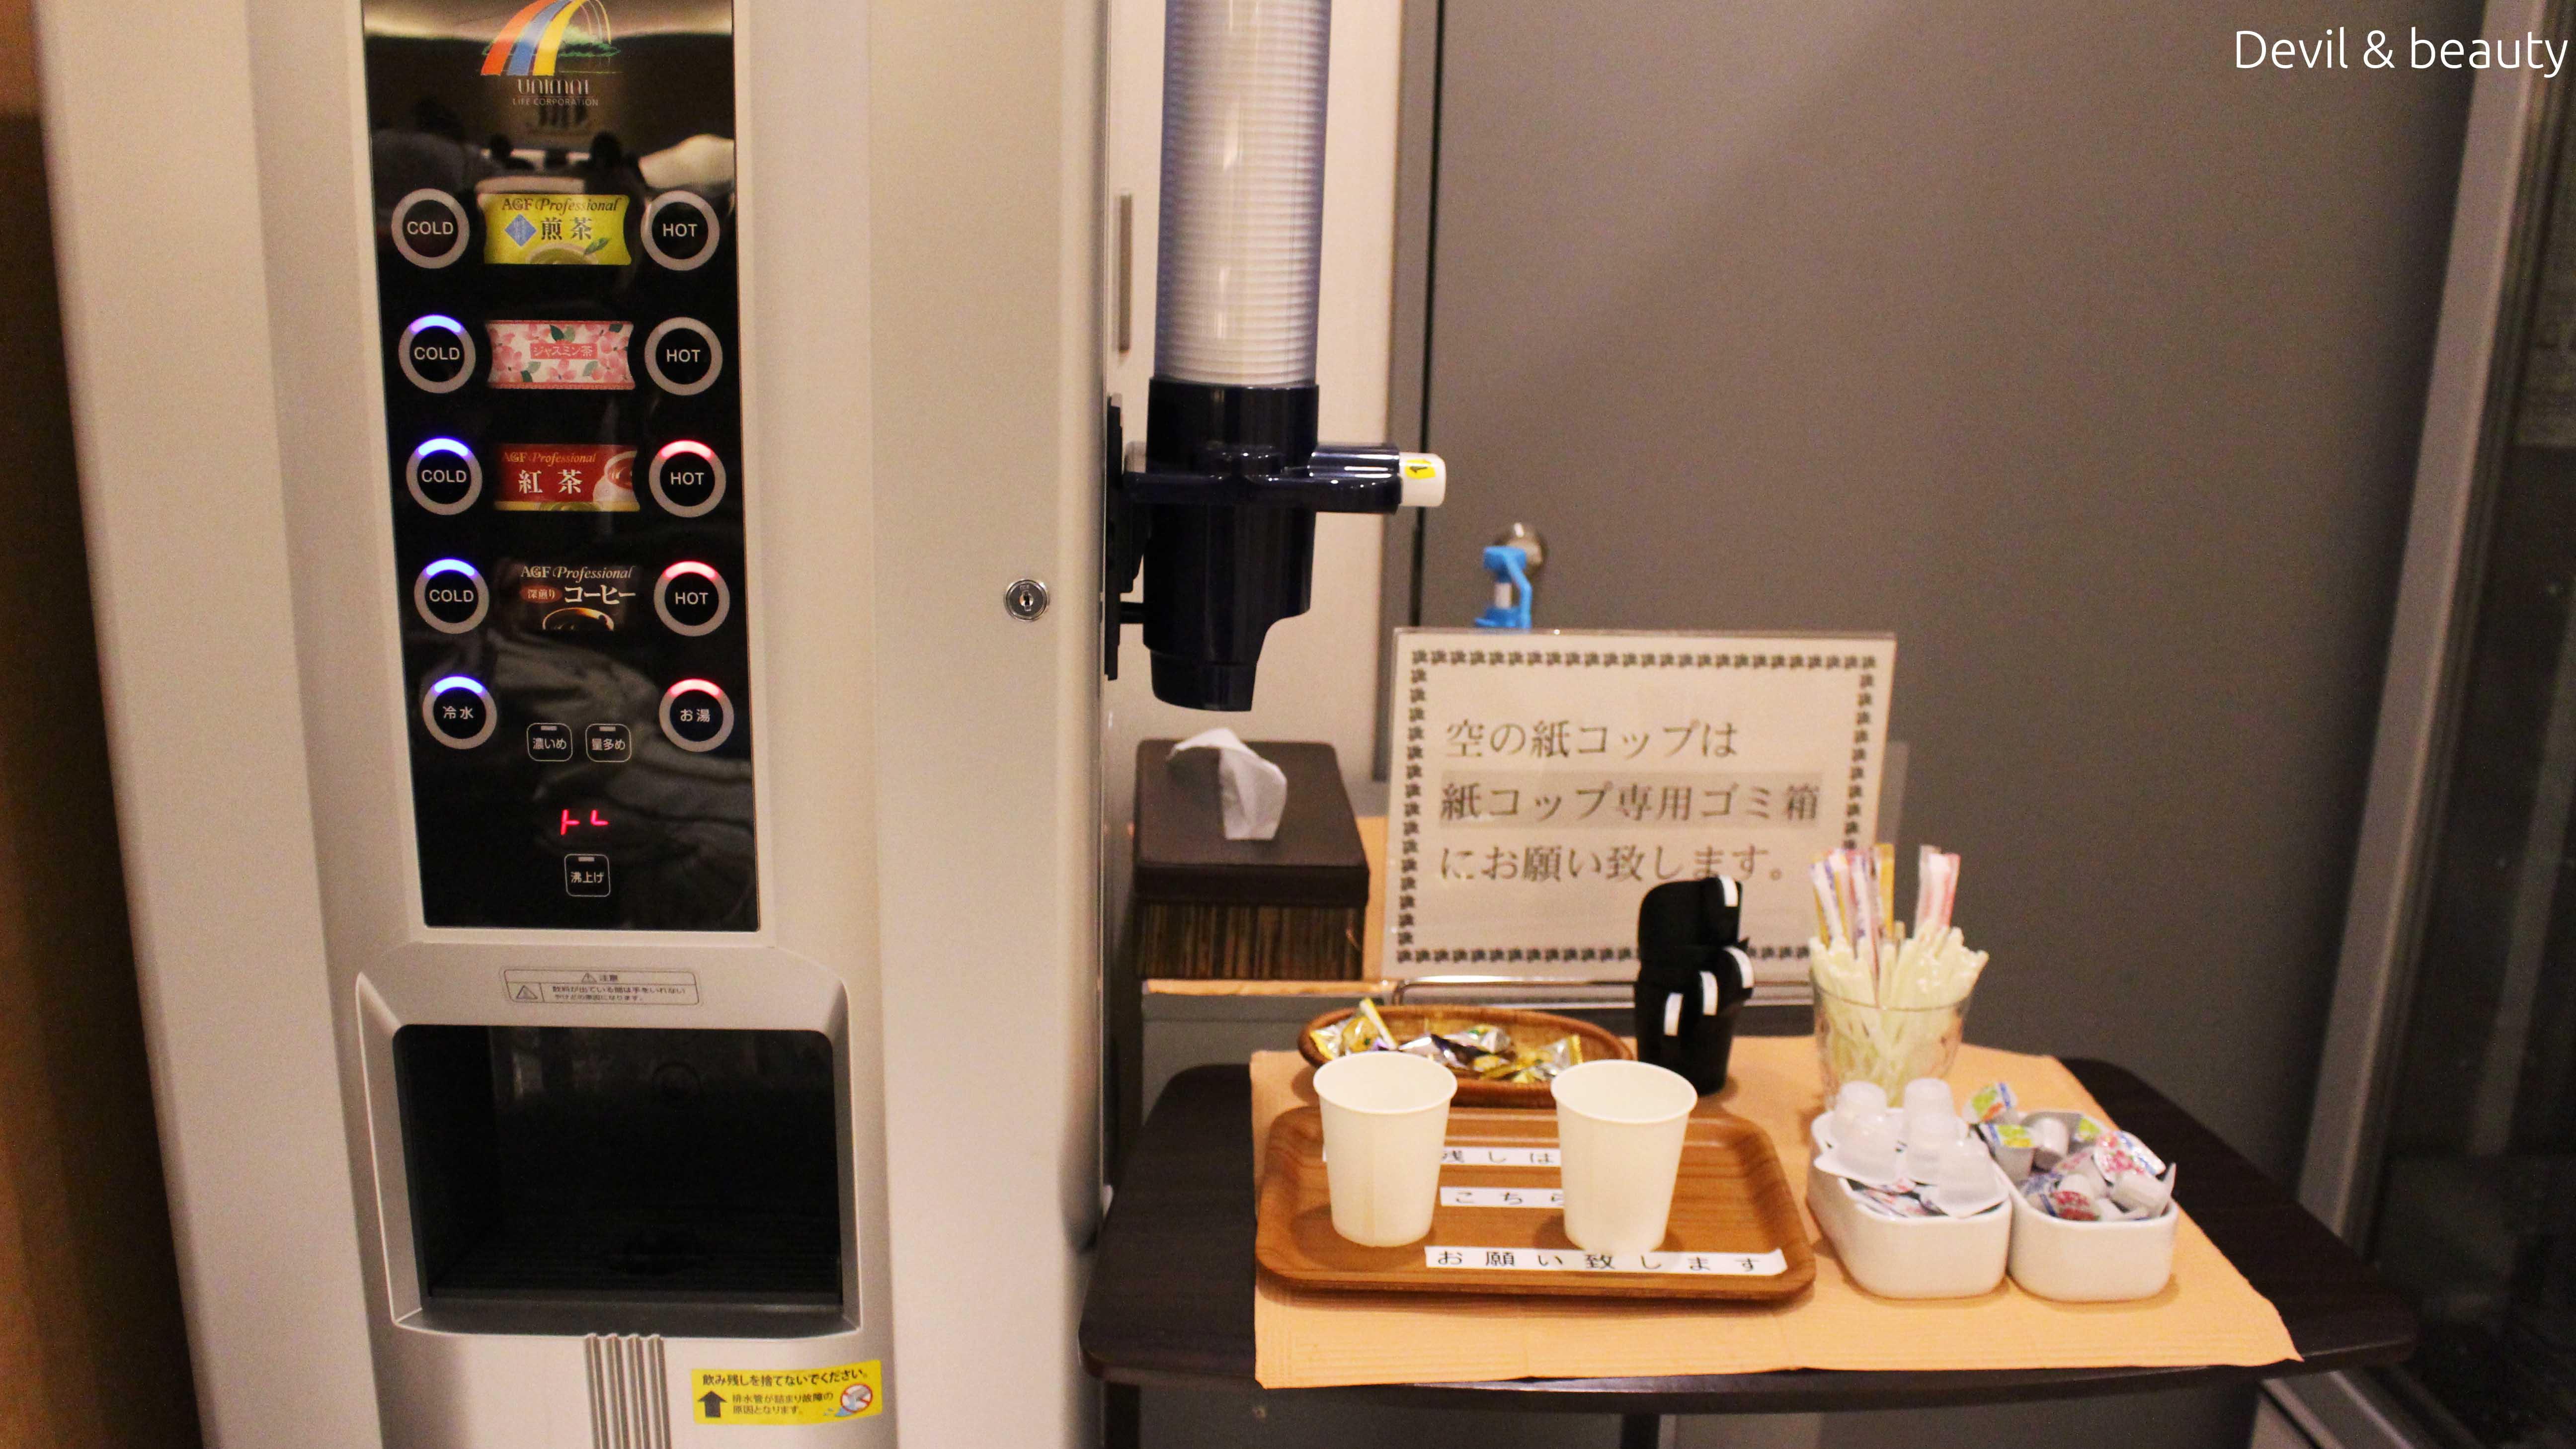 shonan-beauty-clinic-shinjuku5 - image